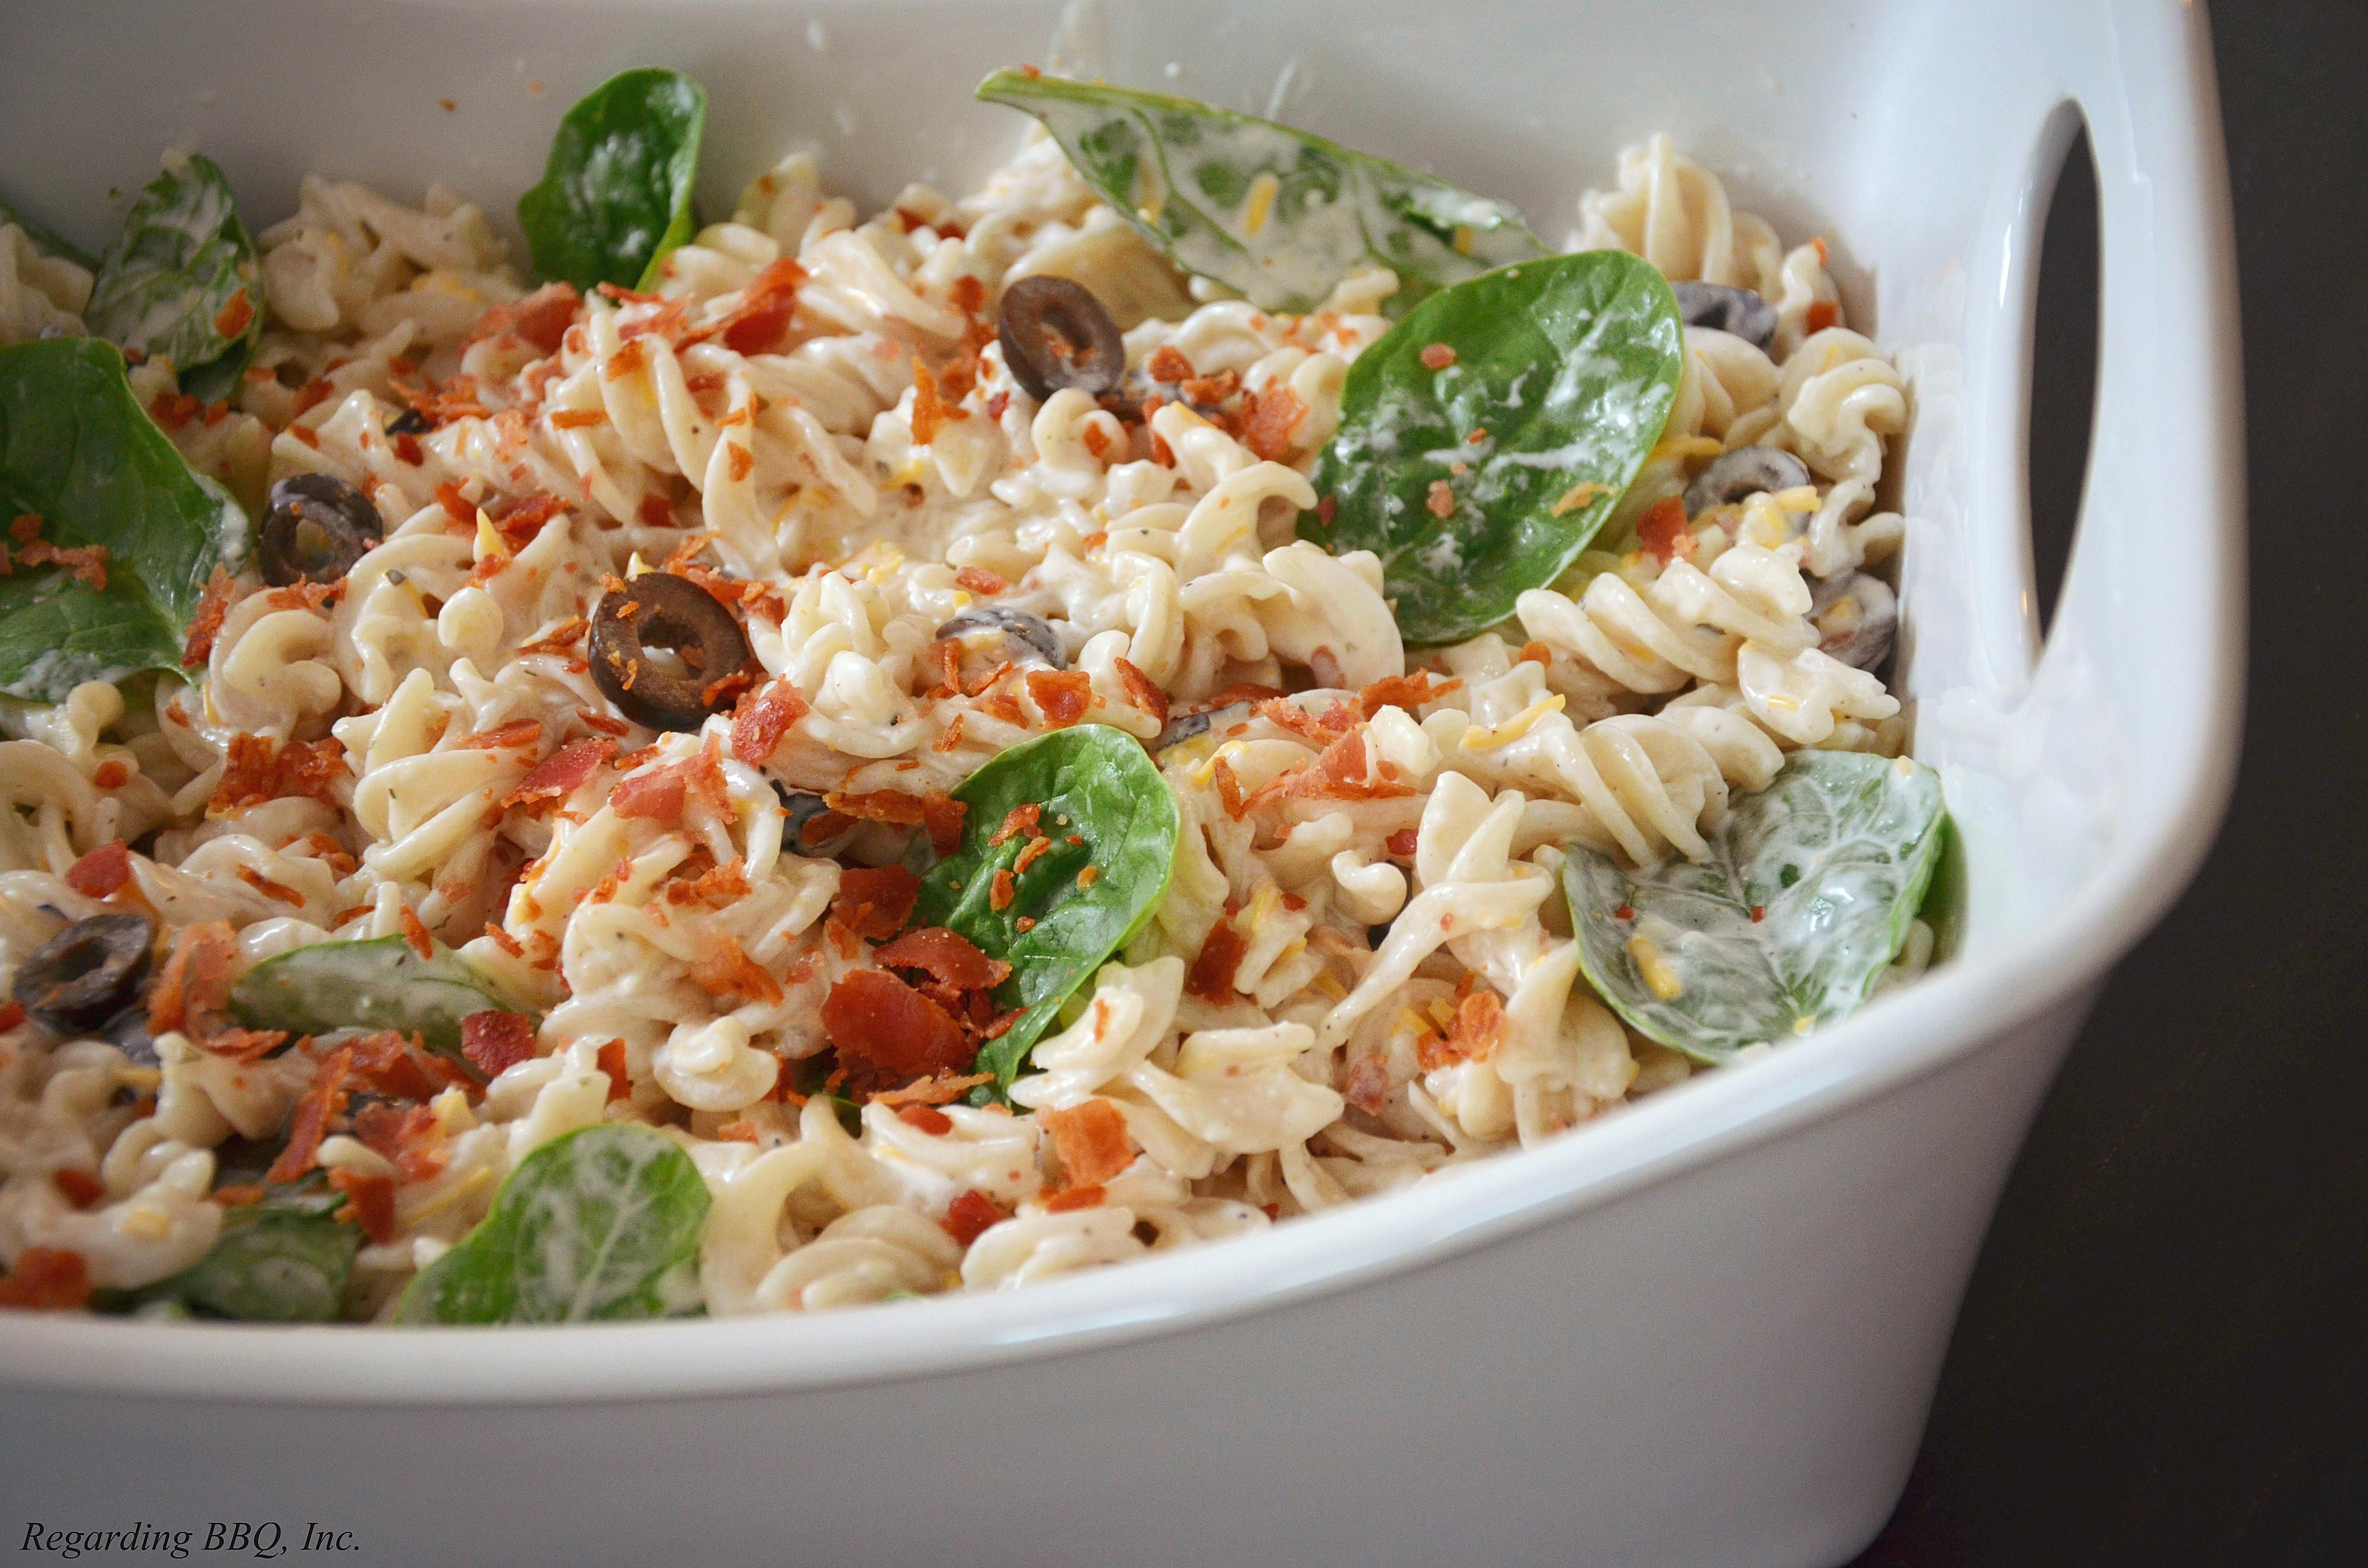 Pancetta Ranch Pasta Salad